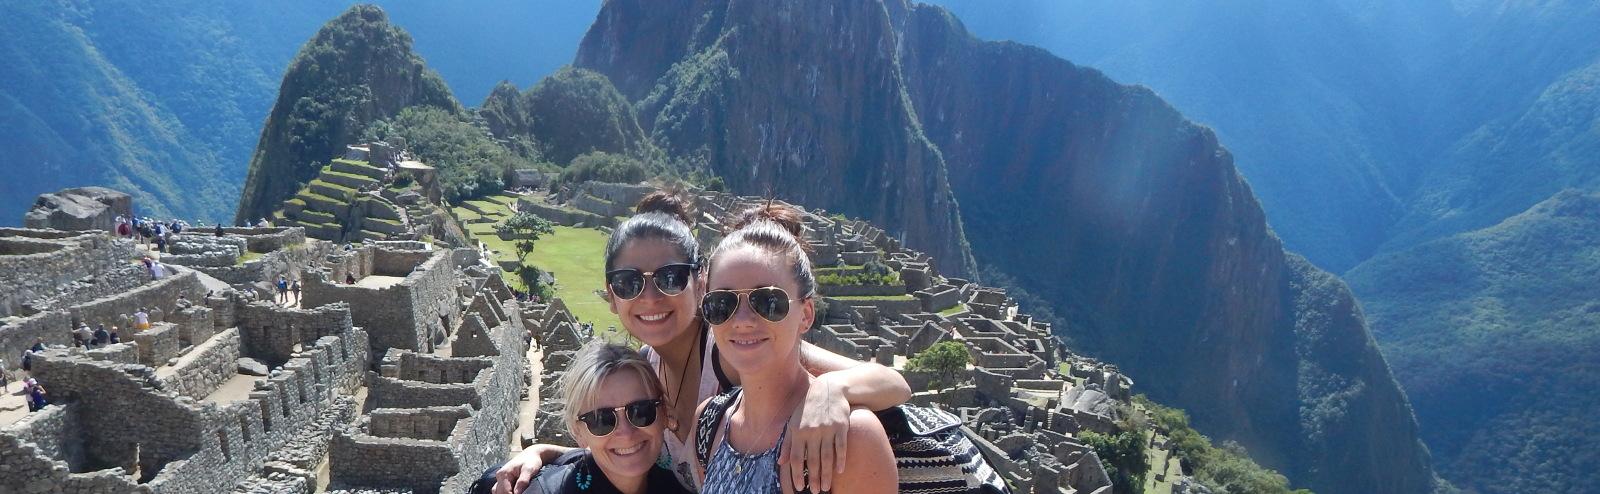 Peru Sacred Valley Machu Picchu Retreat – Jan 9th-18th 2018